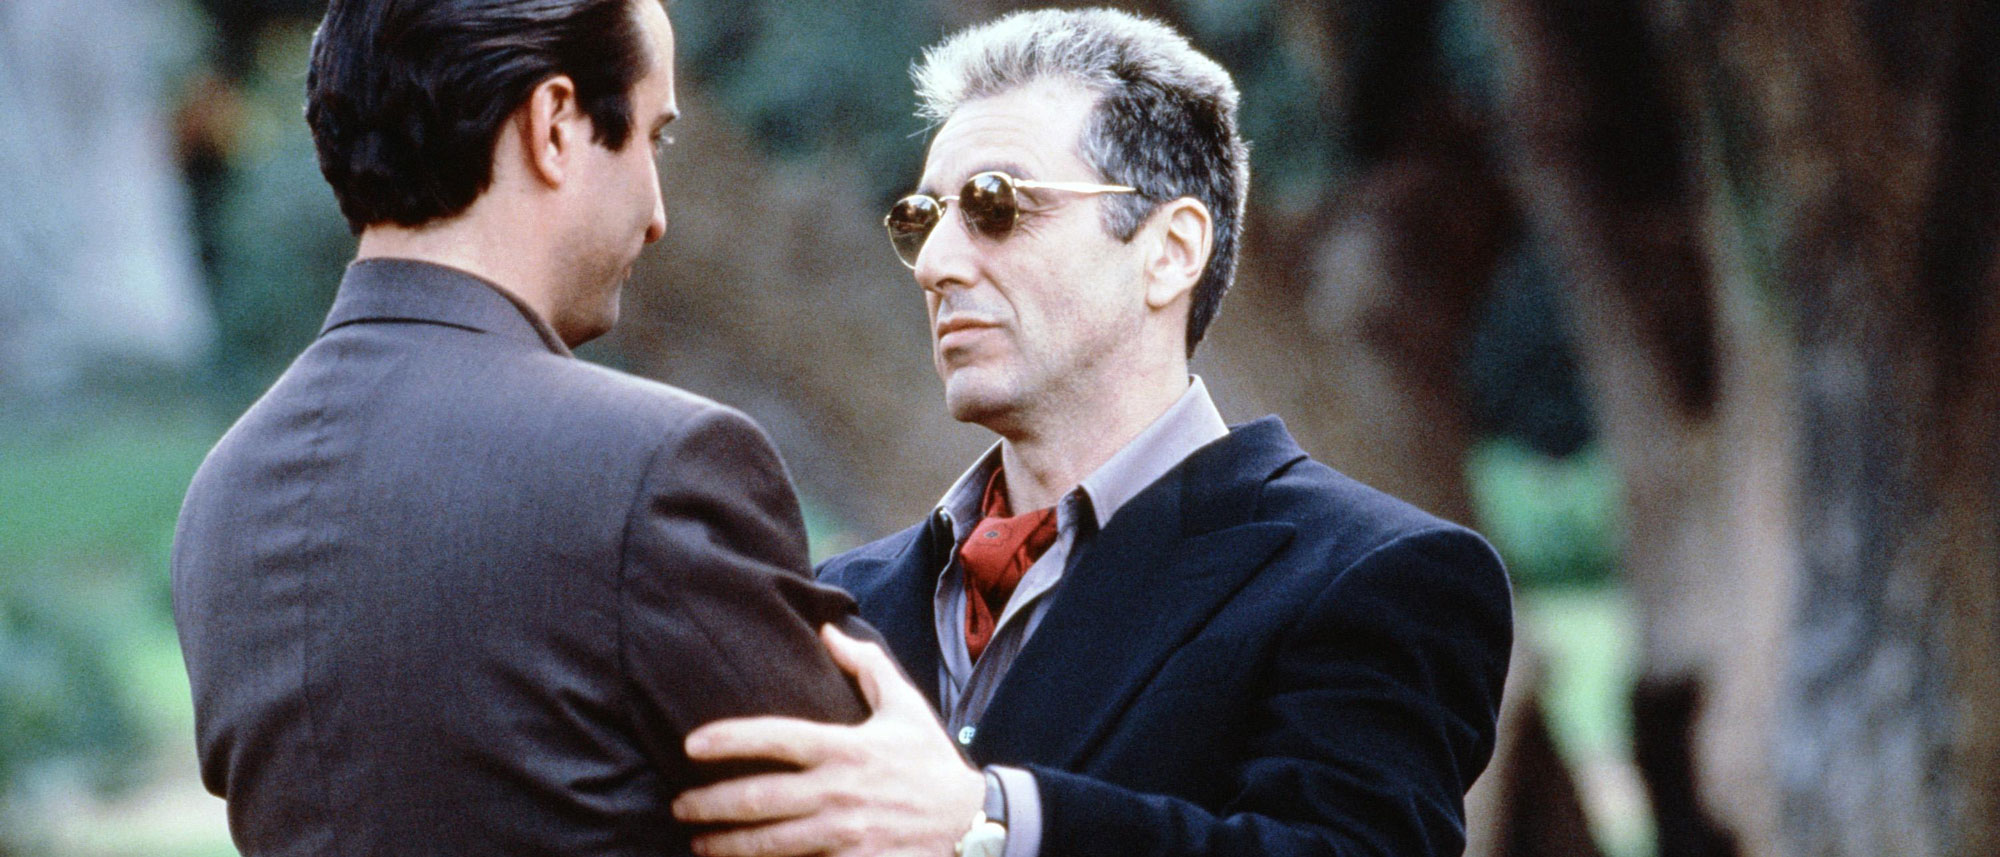 the-godfather-part-iii-atlanta-film